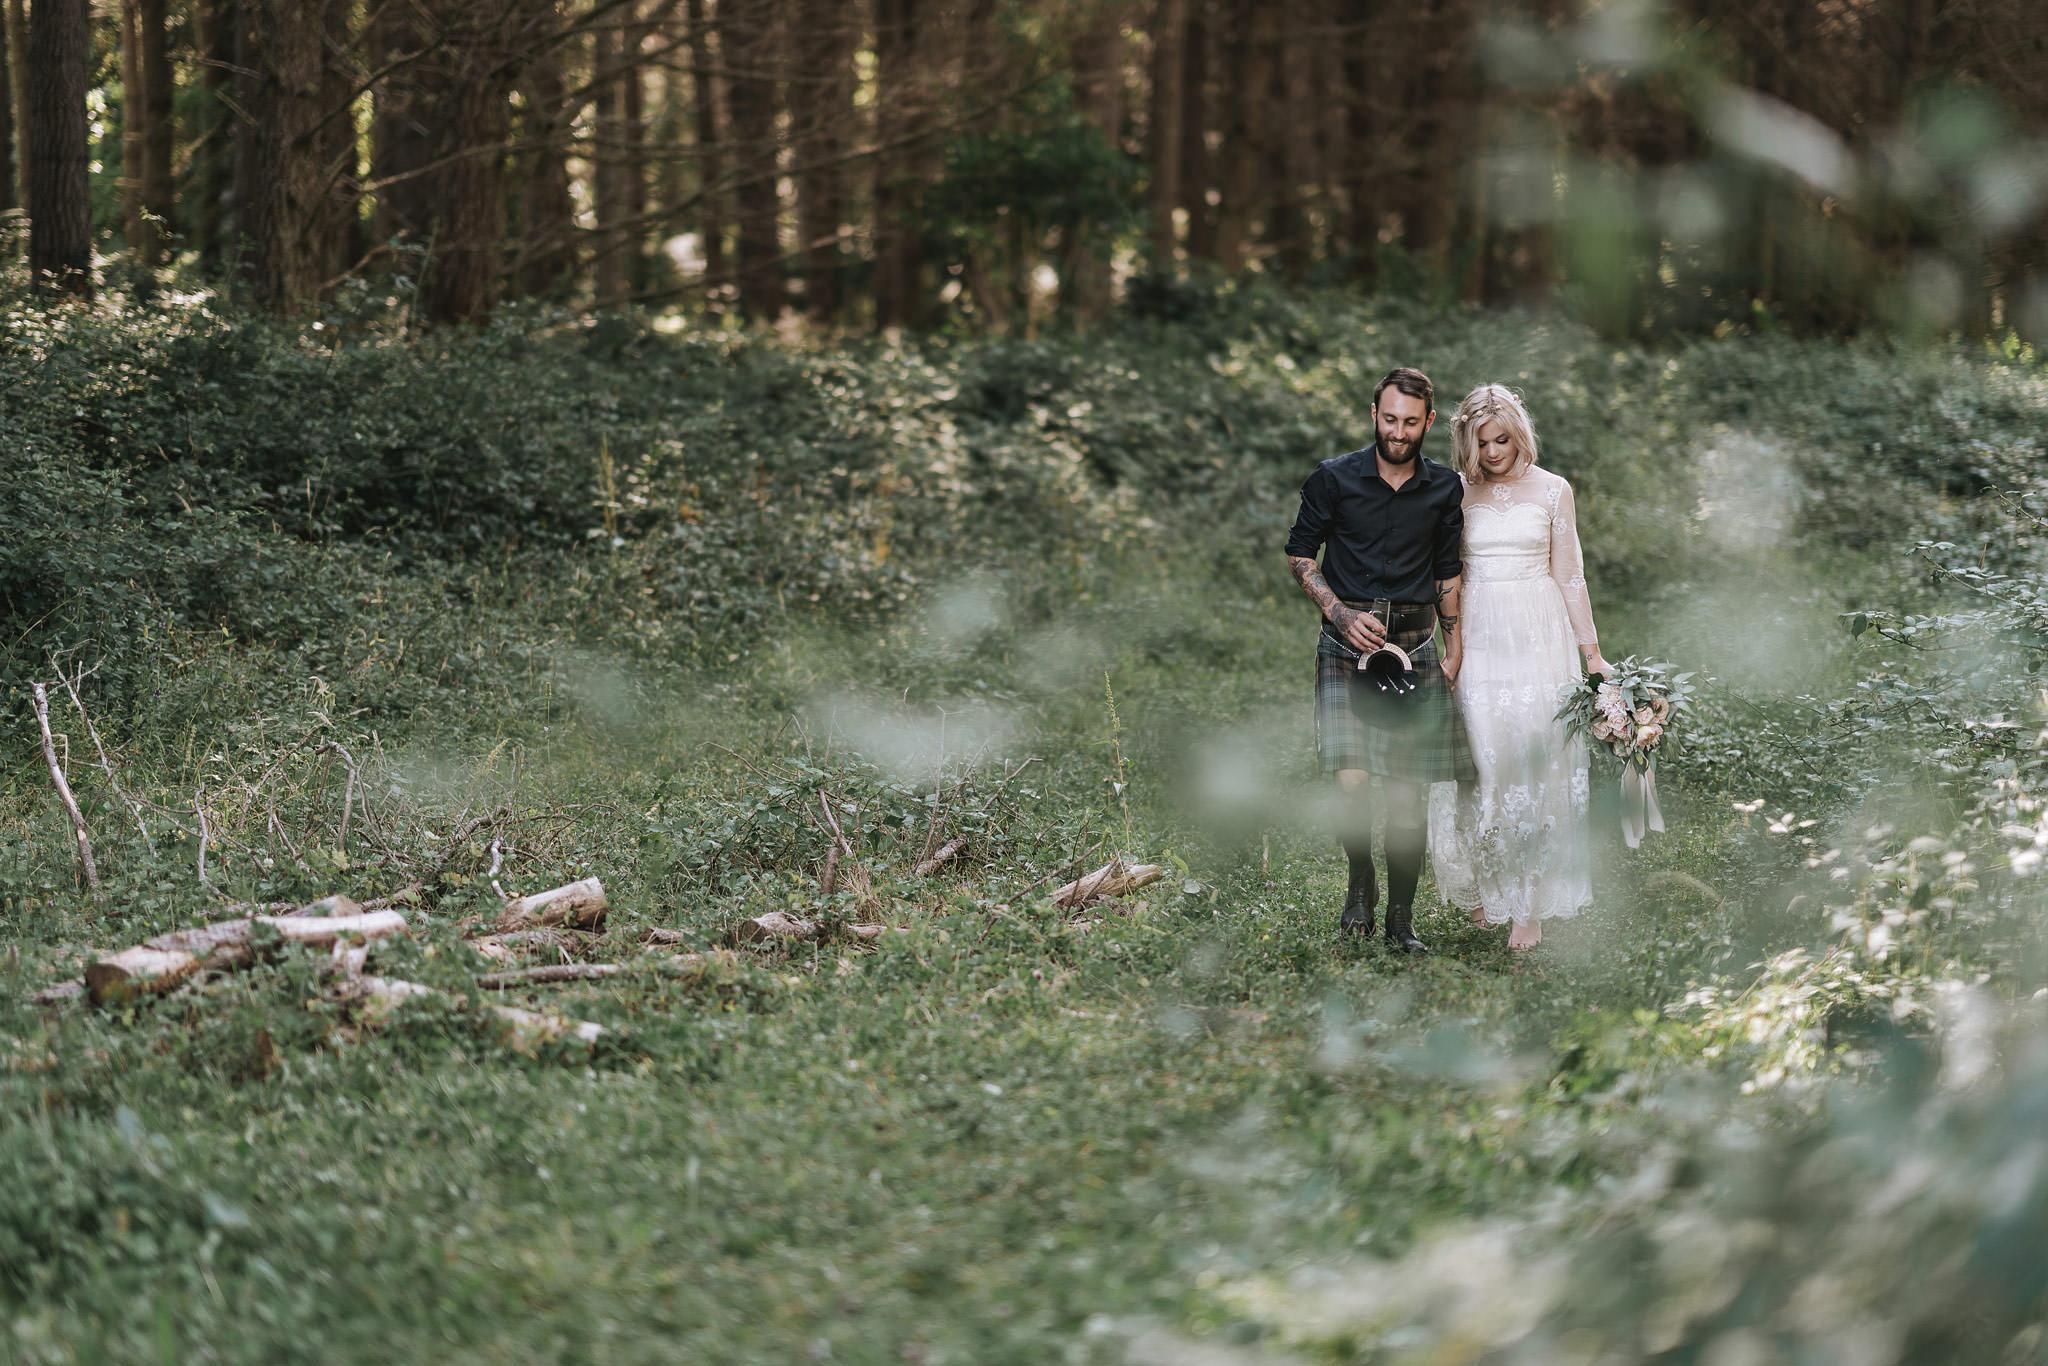 rambo-estrada-natalieryan-old-forest-school-tauranga-wedding-photographers-547-c-copy.jpg